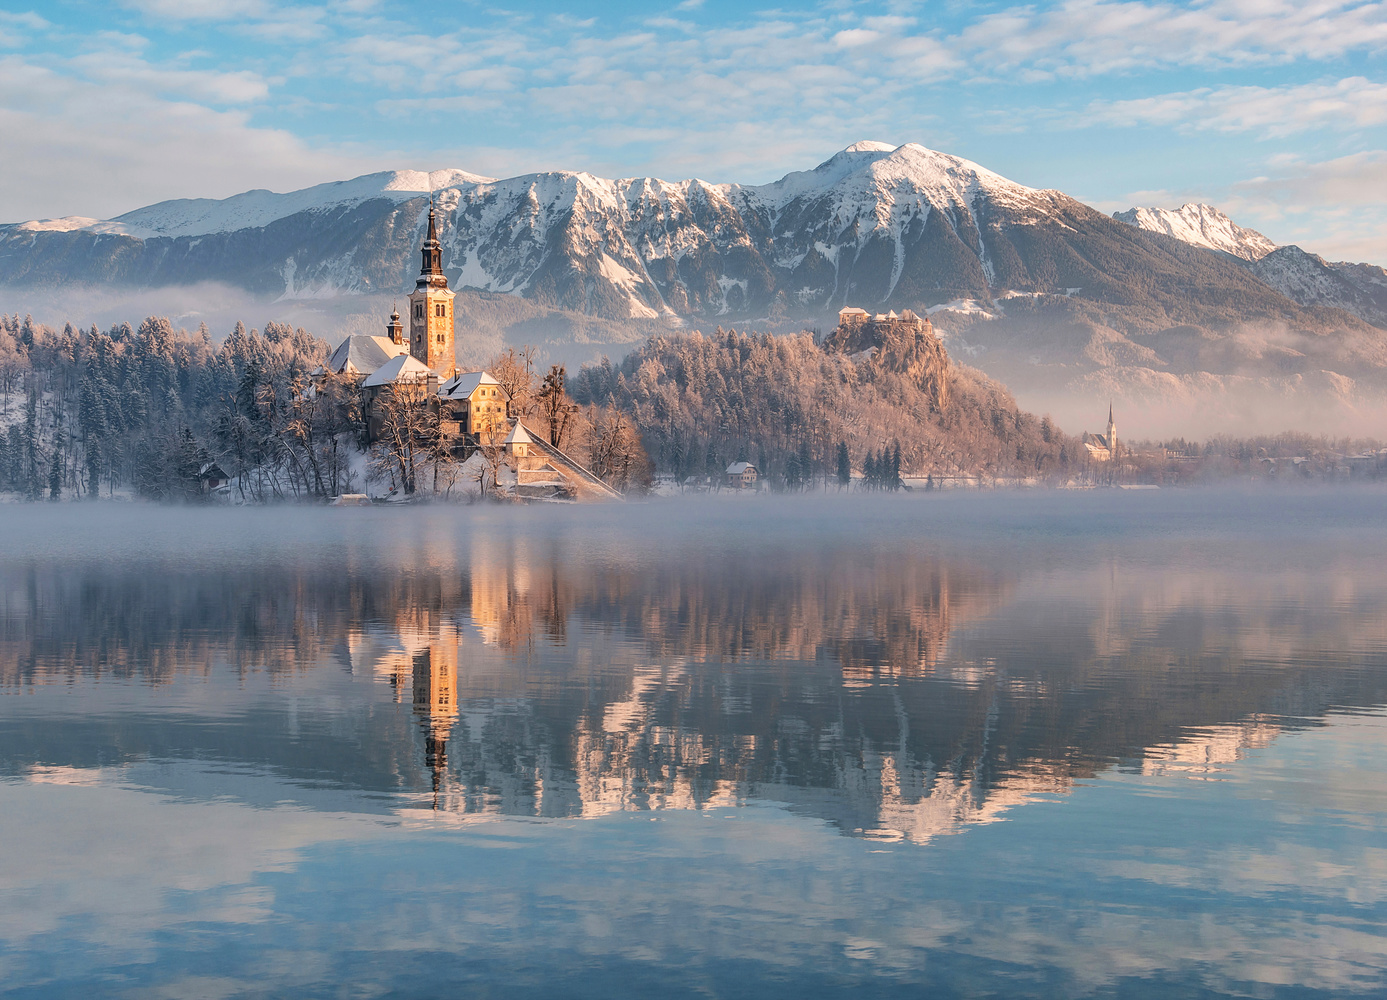 Winter fairytale by Ales Krivec